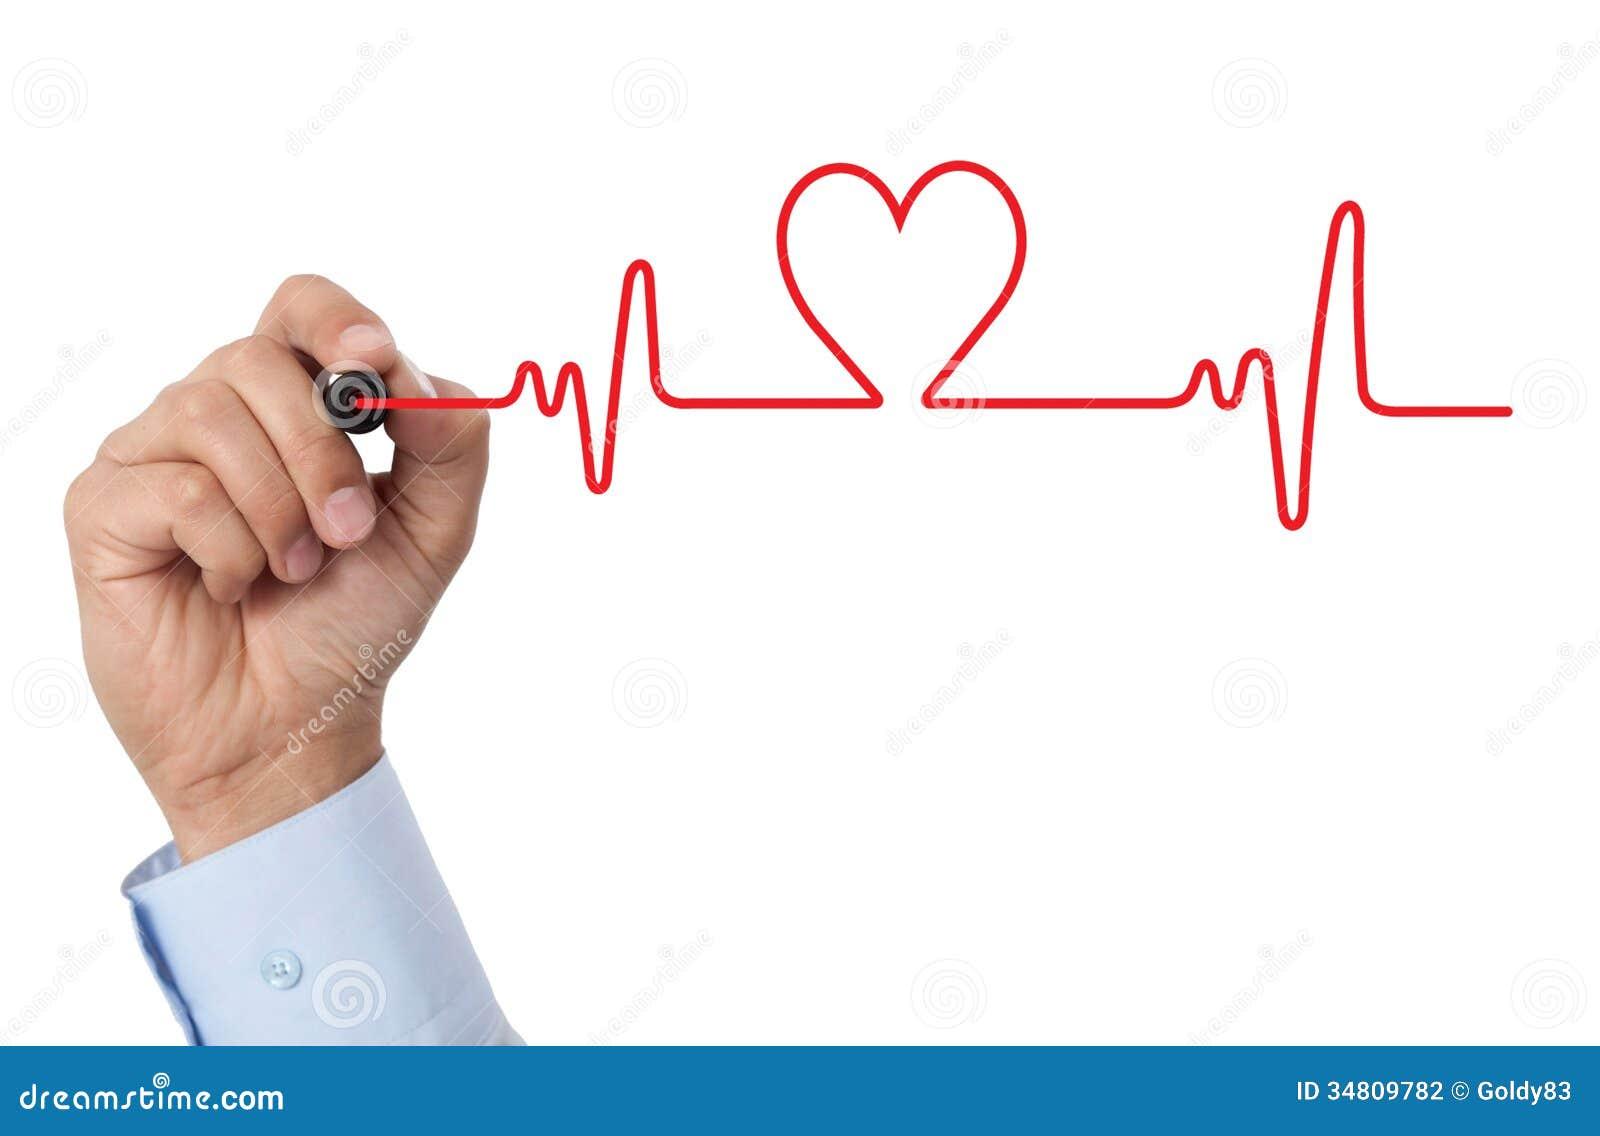 Draw a heart chart stock illustration illustration of health draw a heart chart ccuart Image collections